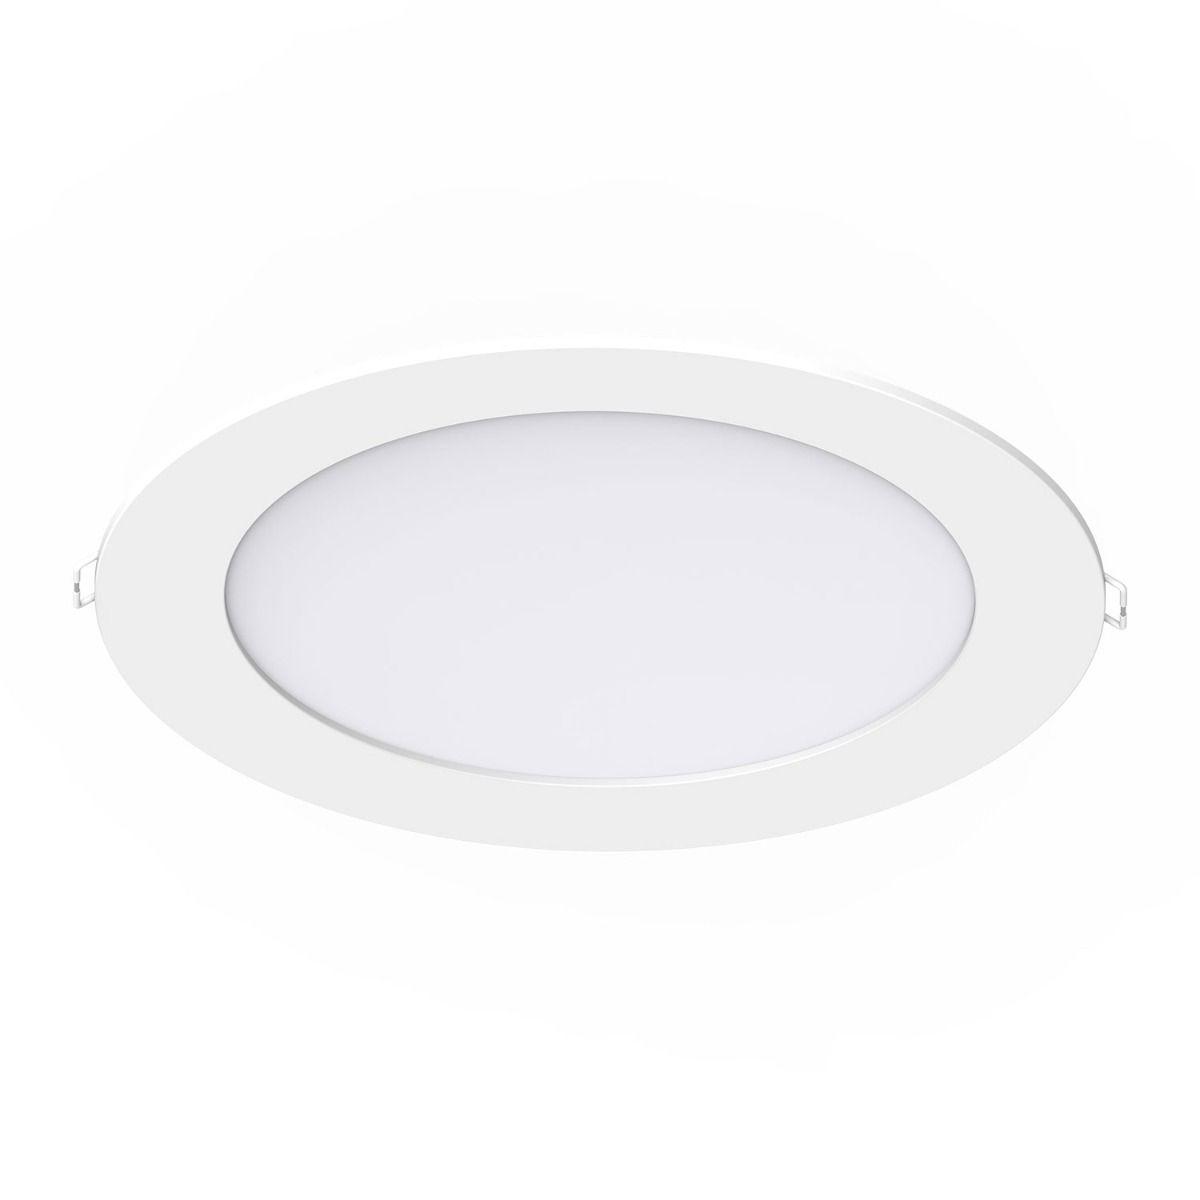 Noxion LEDDownlight SlimV2.0IP44 24W3000K Uitsnijden Ø200mm w/ DALI